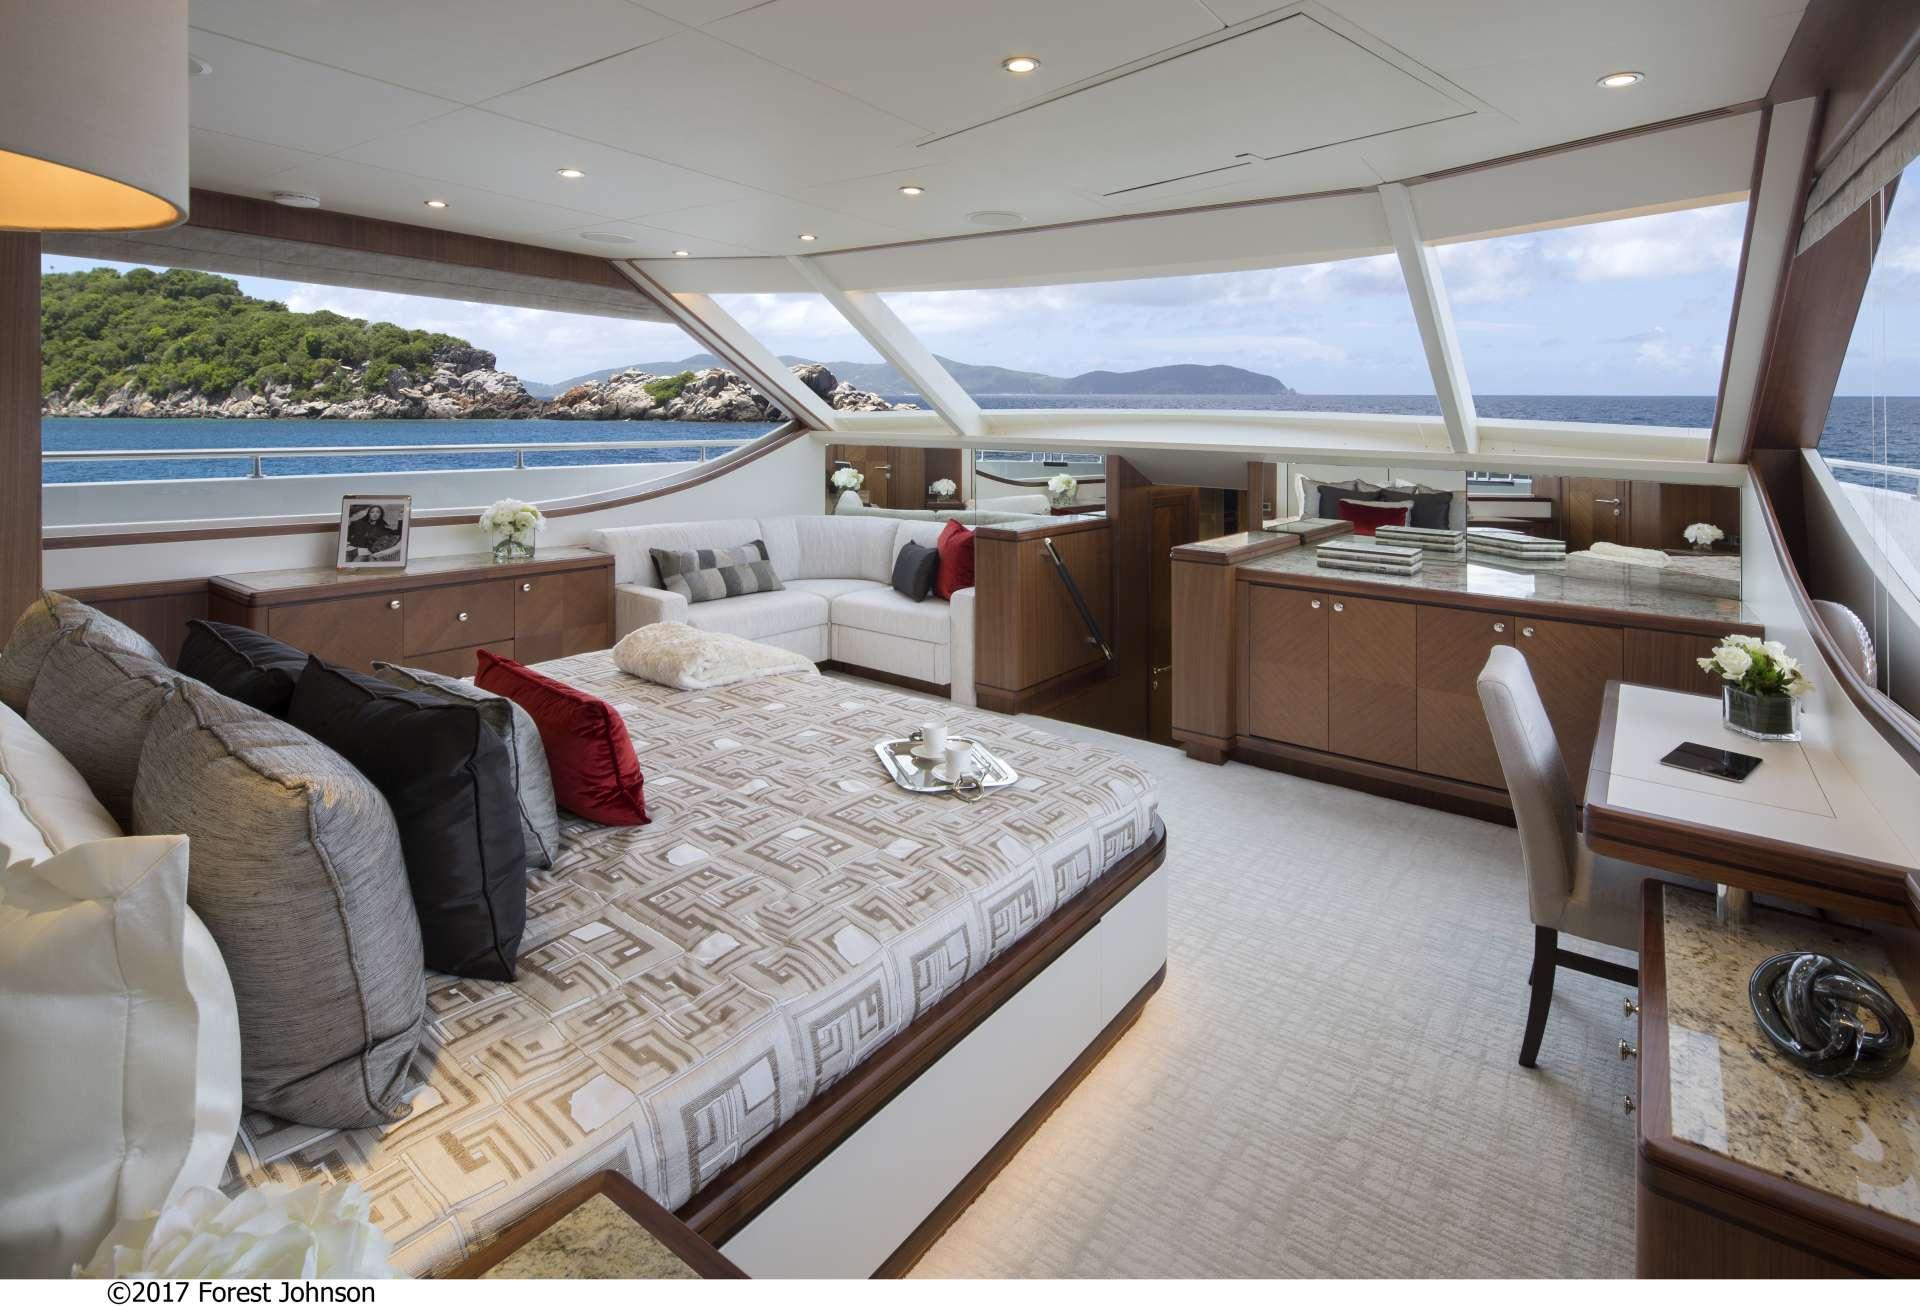 SUGARAY yacht image # 9